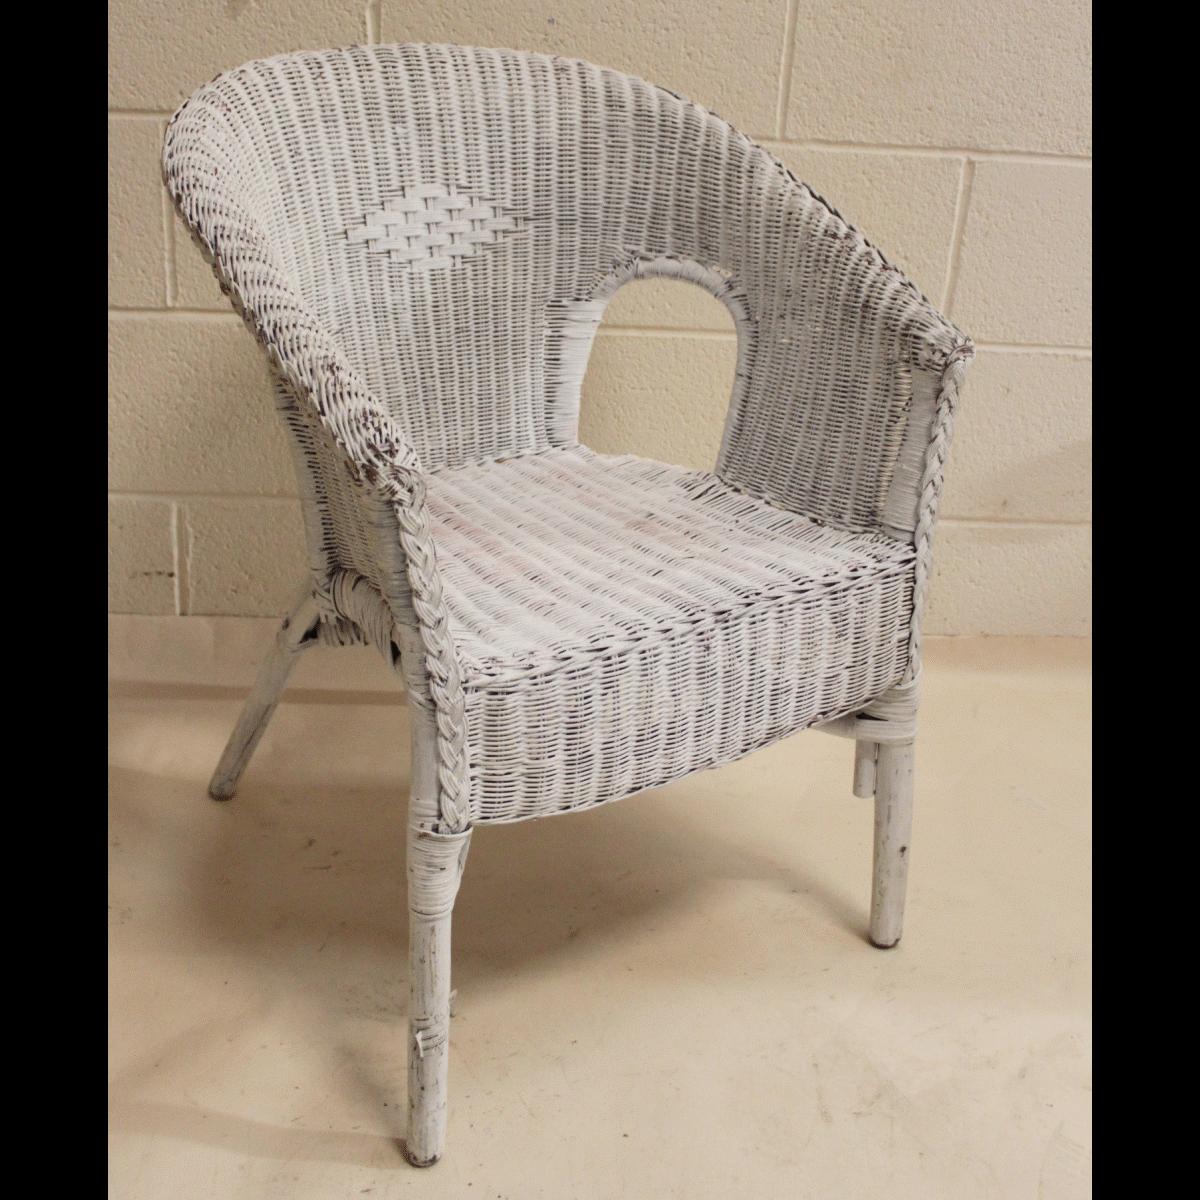 0085347 Wicker Chairs X2 77cm Long By 59cm Wide